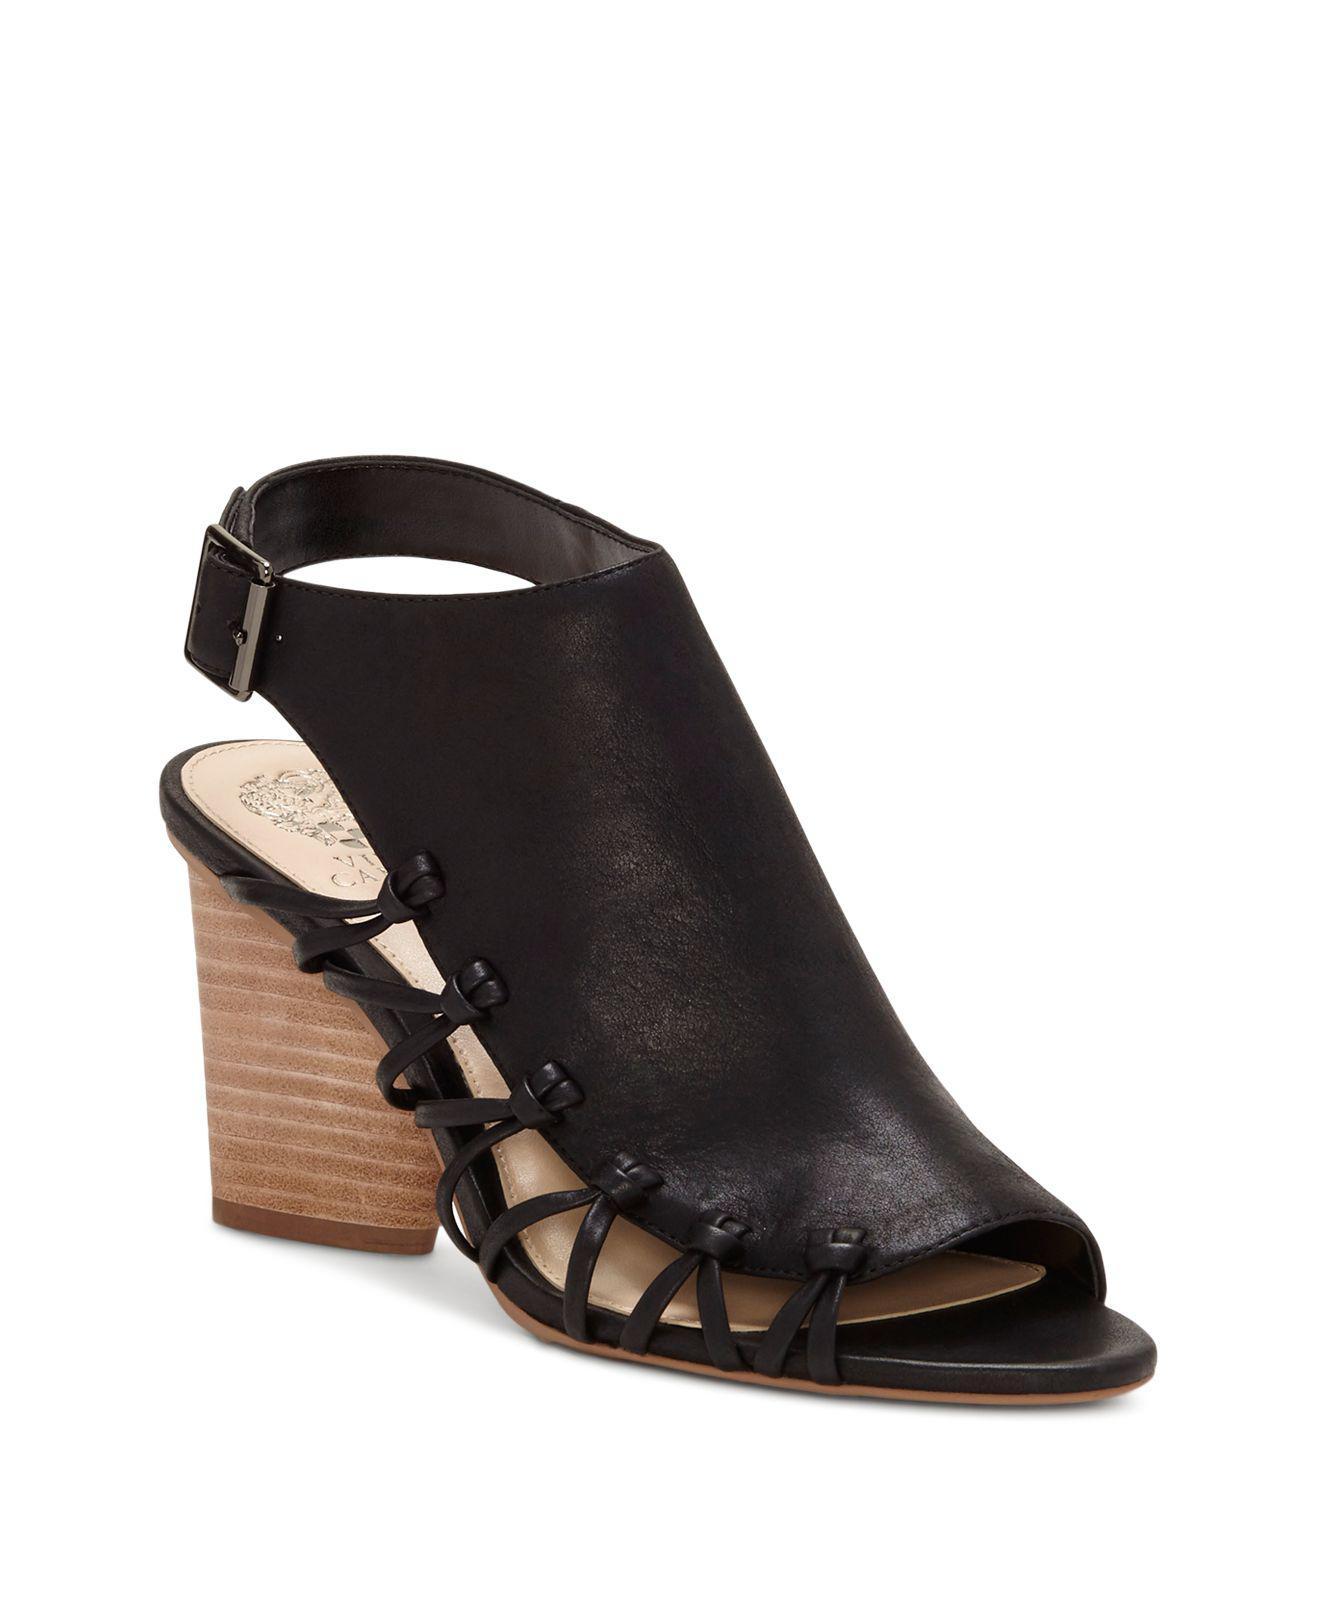 Vince Camuto Women's Ankara Leather Knot Detail High-Heel Sandals TNWd5I5l0